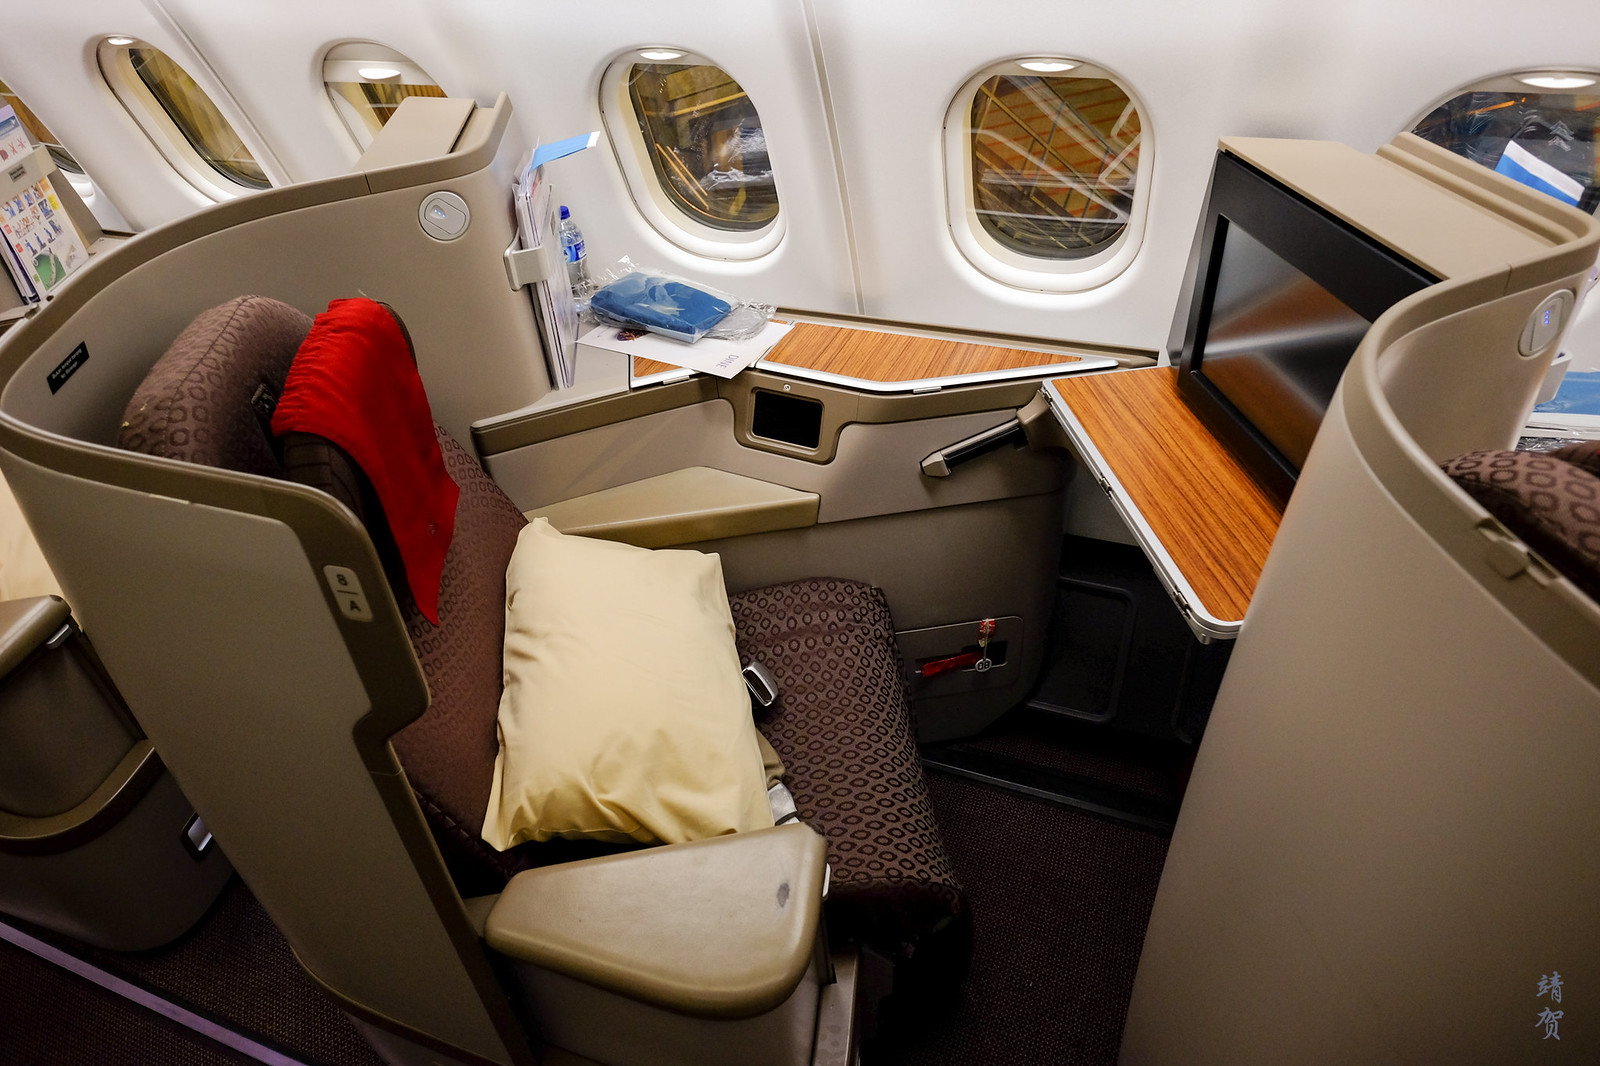 Window Business Class seat